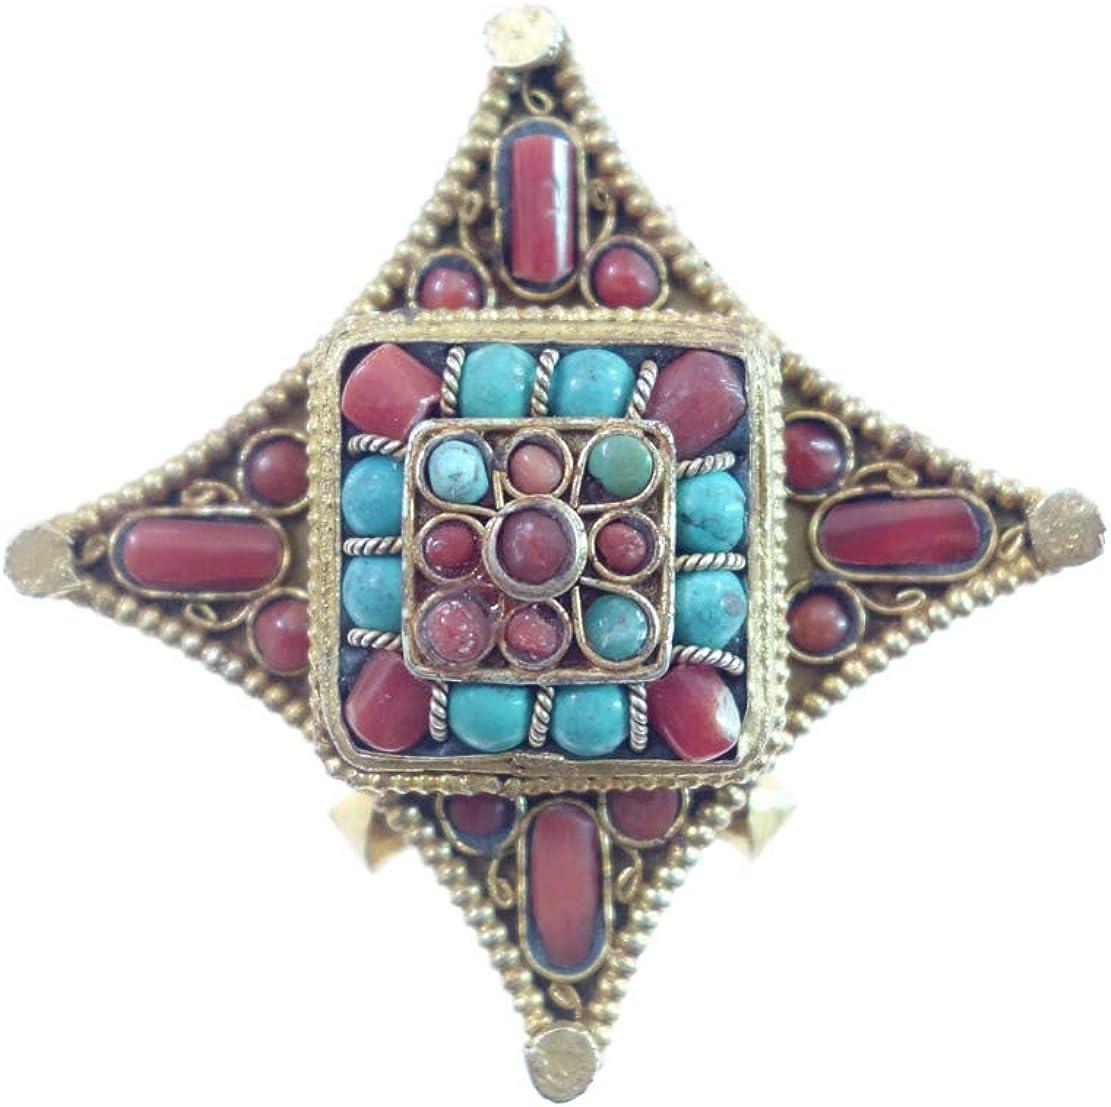 Chapado En Oro Diseñador Medallón Colgante Hecho A Mano Para Mujeres Natural Coral Y Turquesa Piedras Preciosas Moda Étnica Tibetano Budista Bohemio Boho Gitano Amuleto Moderno Joyería Por Artesanos